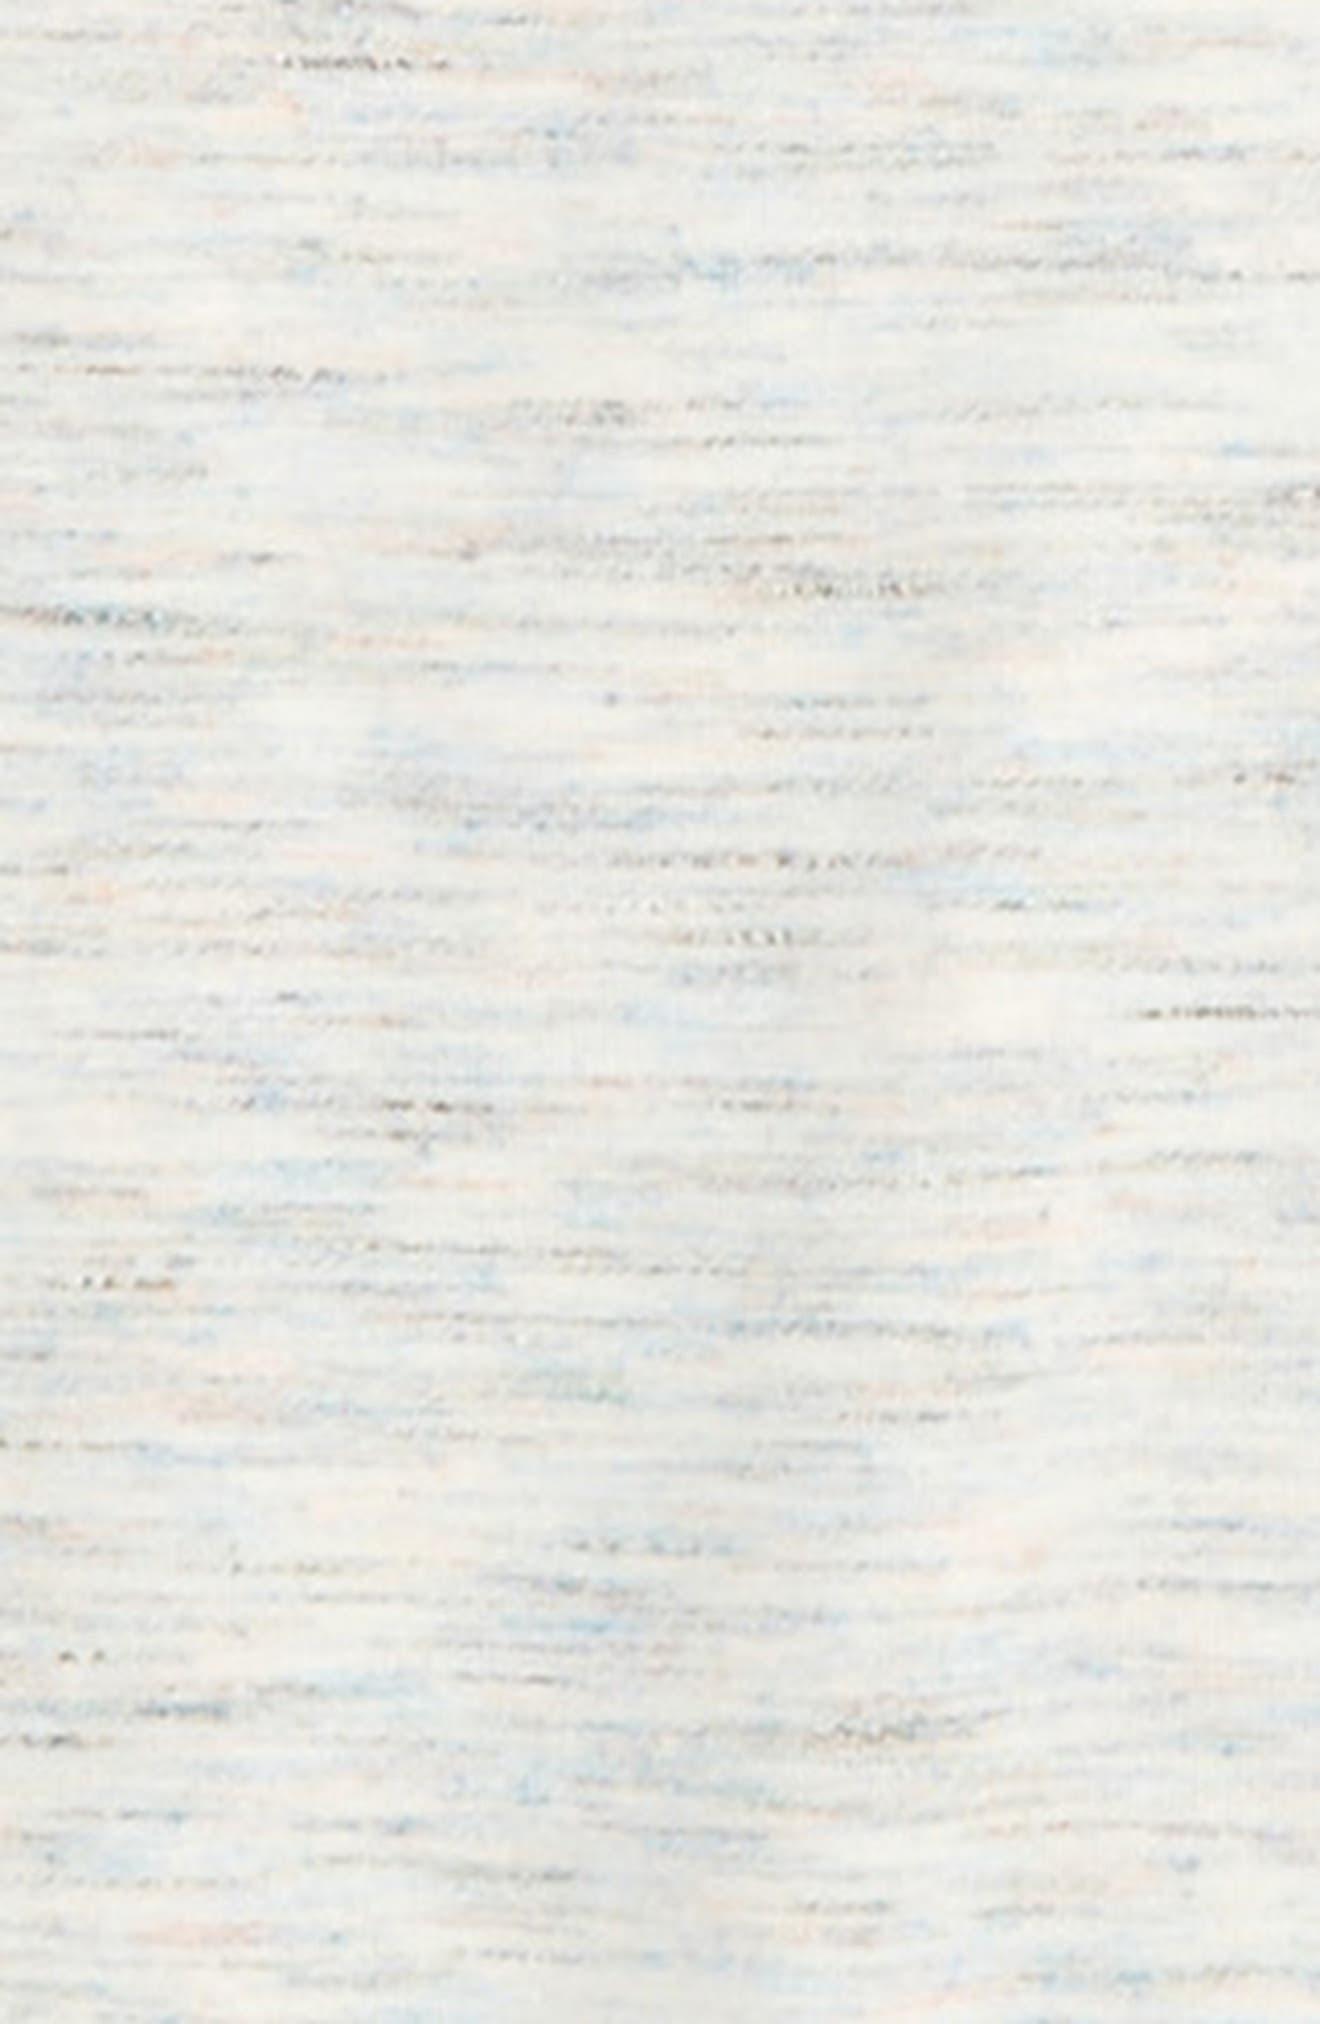 Space Dye Tunic,                             Alternate thumbnail 3, color,                             Ivory Egret Multi